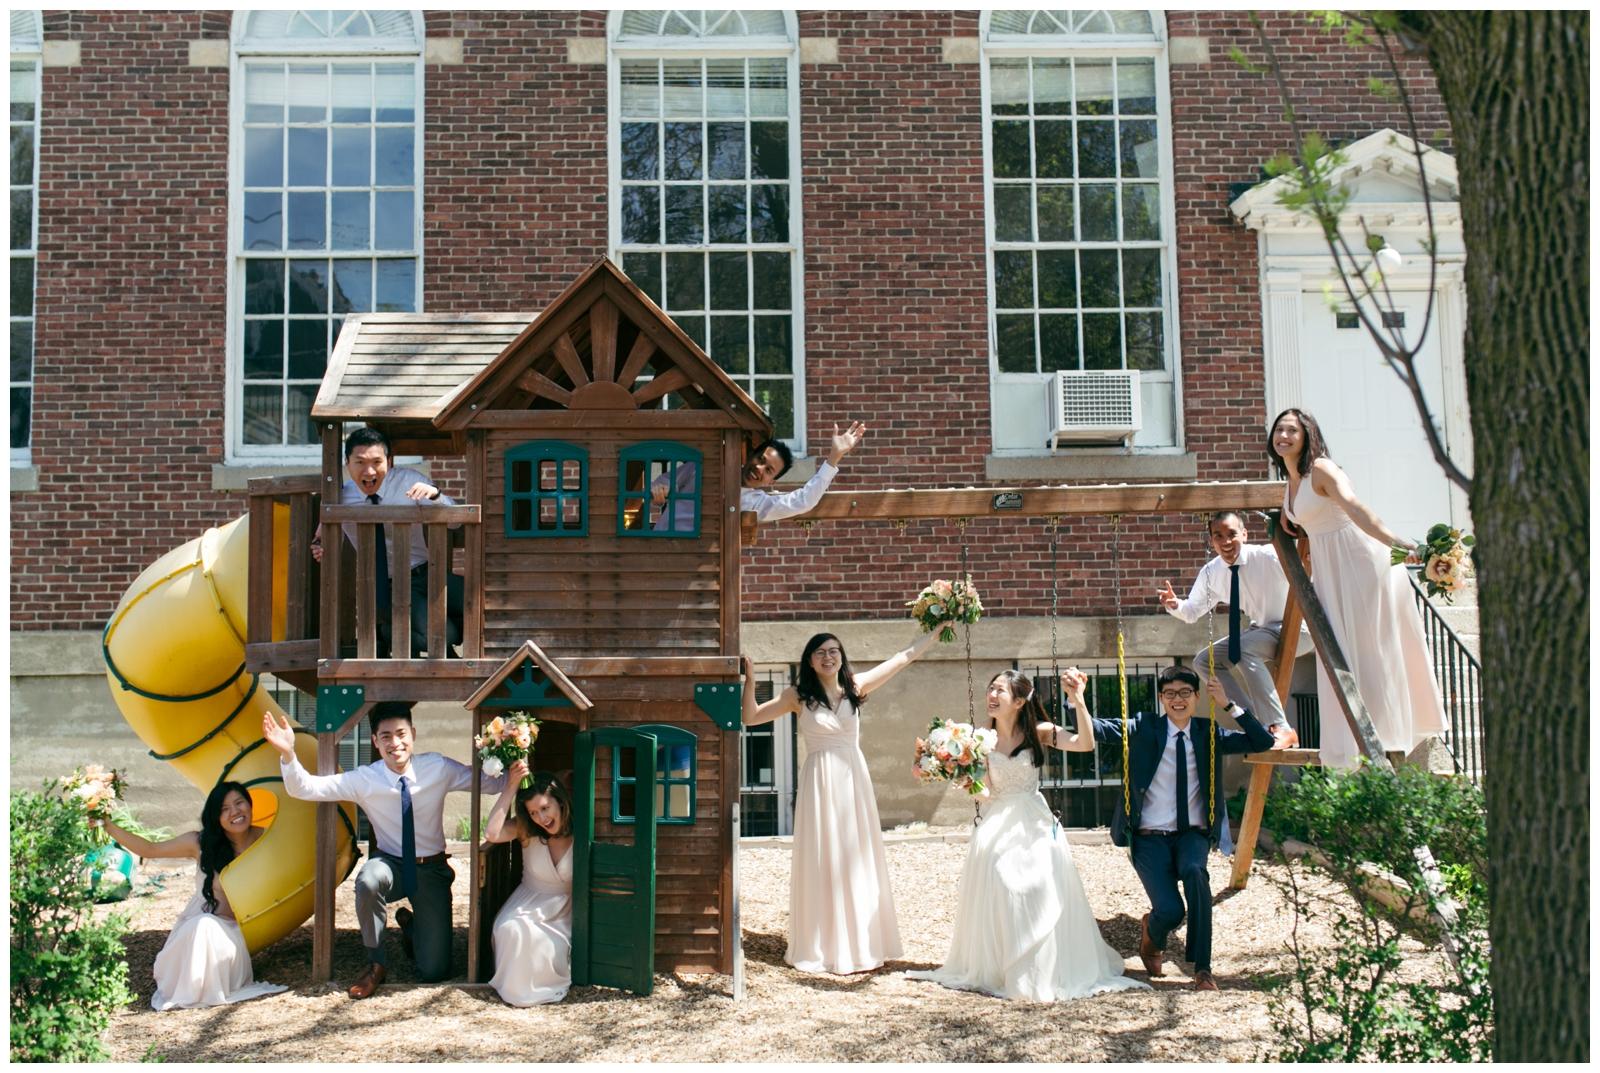 Samberg-Conference-Center-Boston-Wedding-Photographer-Bailey-Q-Photo-076.jpg